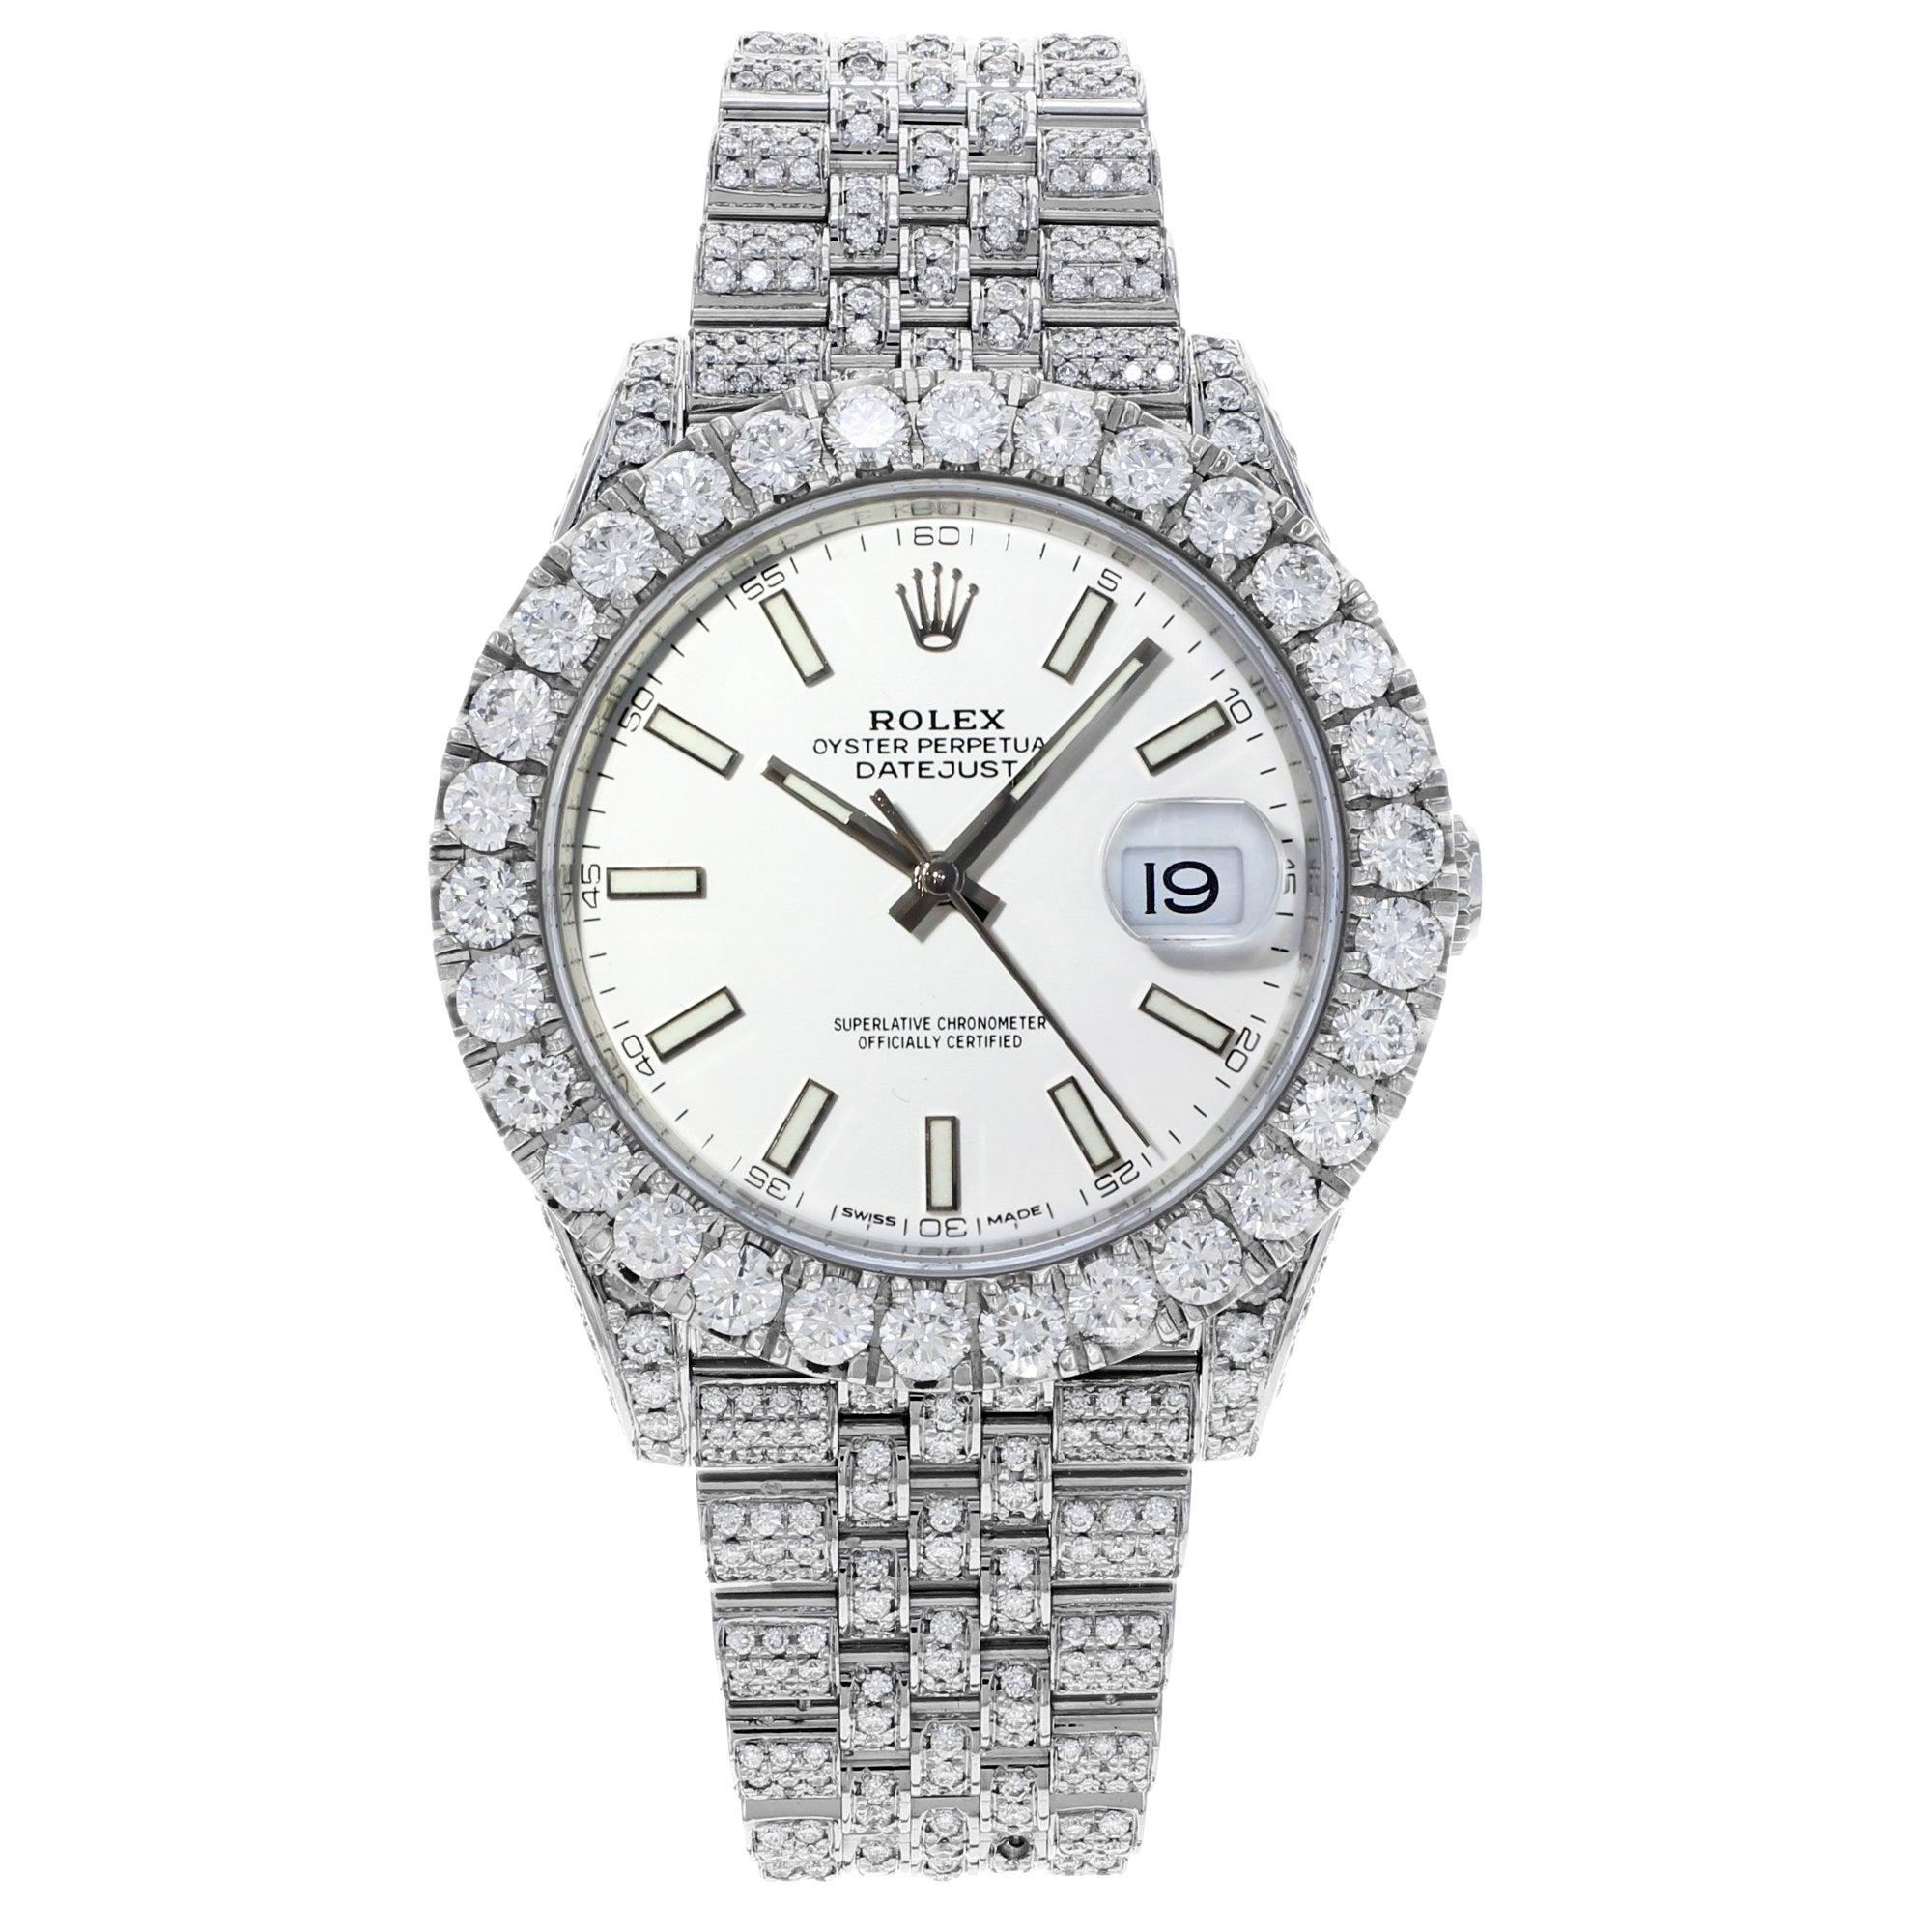 Rolex Datejust 41 126300 Custom Diamonds 20Ct White Stick Dial Automatic Watch